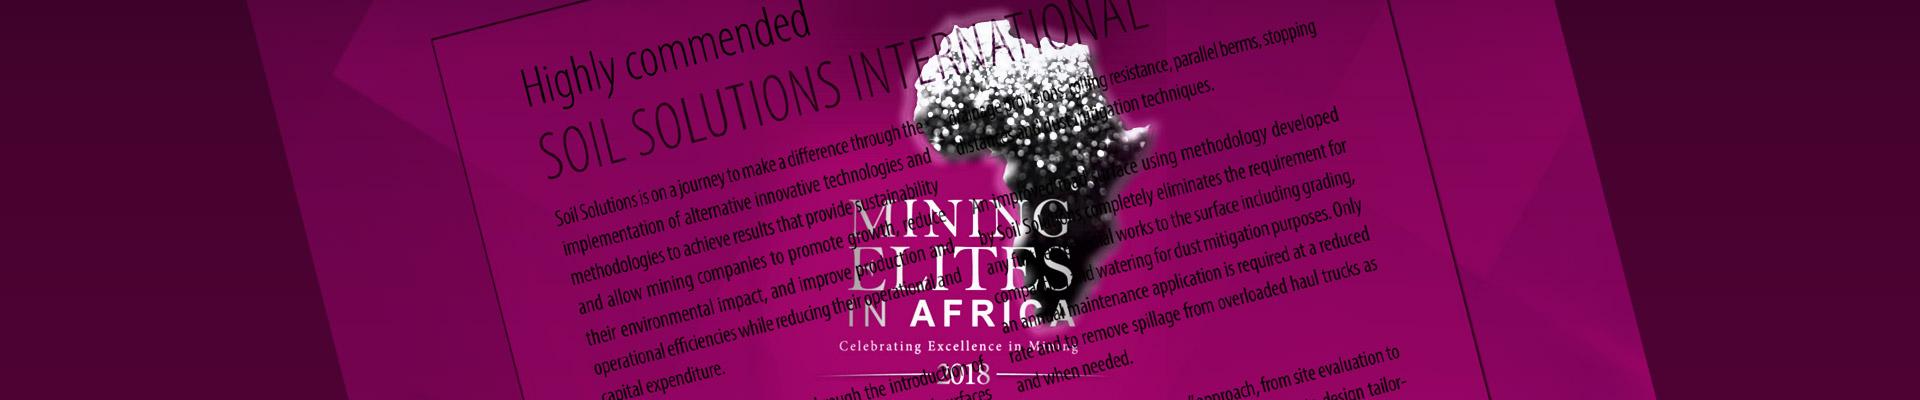 MIning Elites in Africa Article